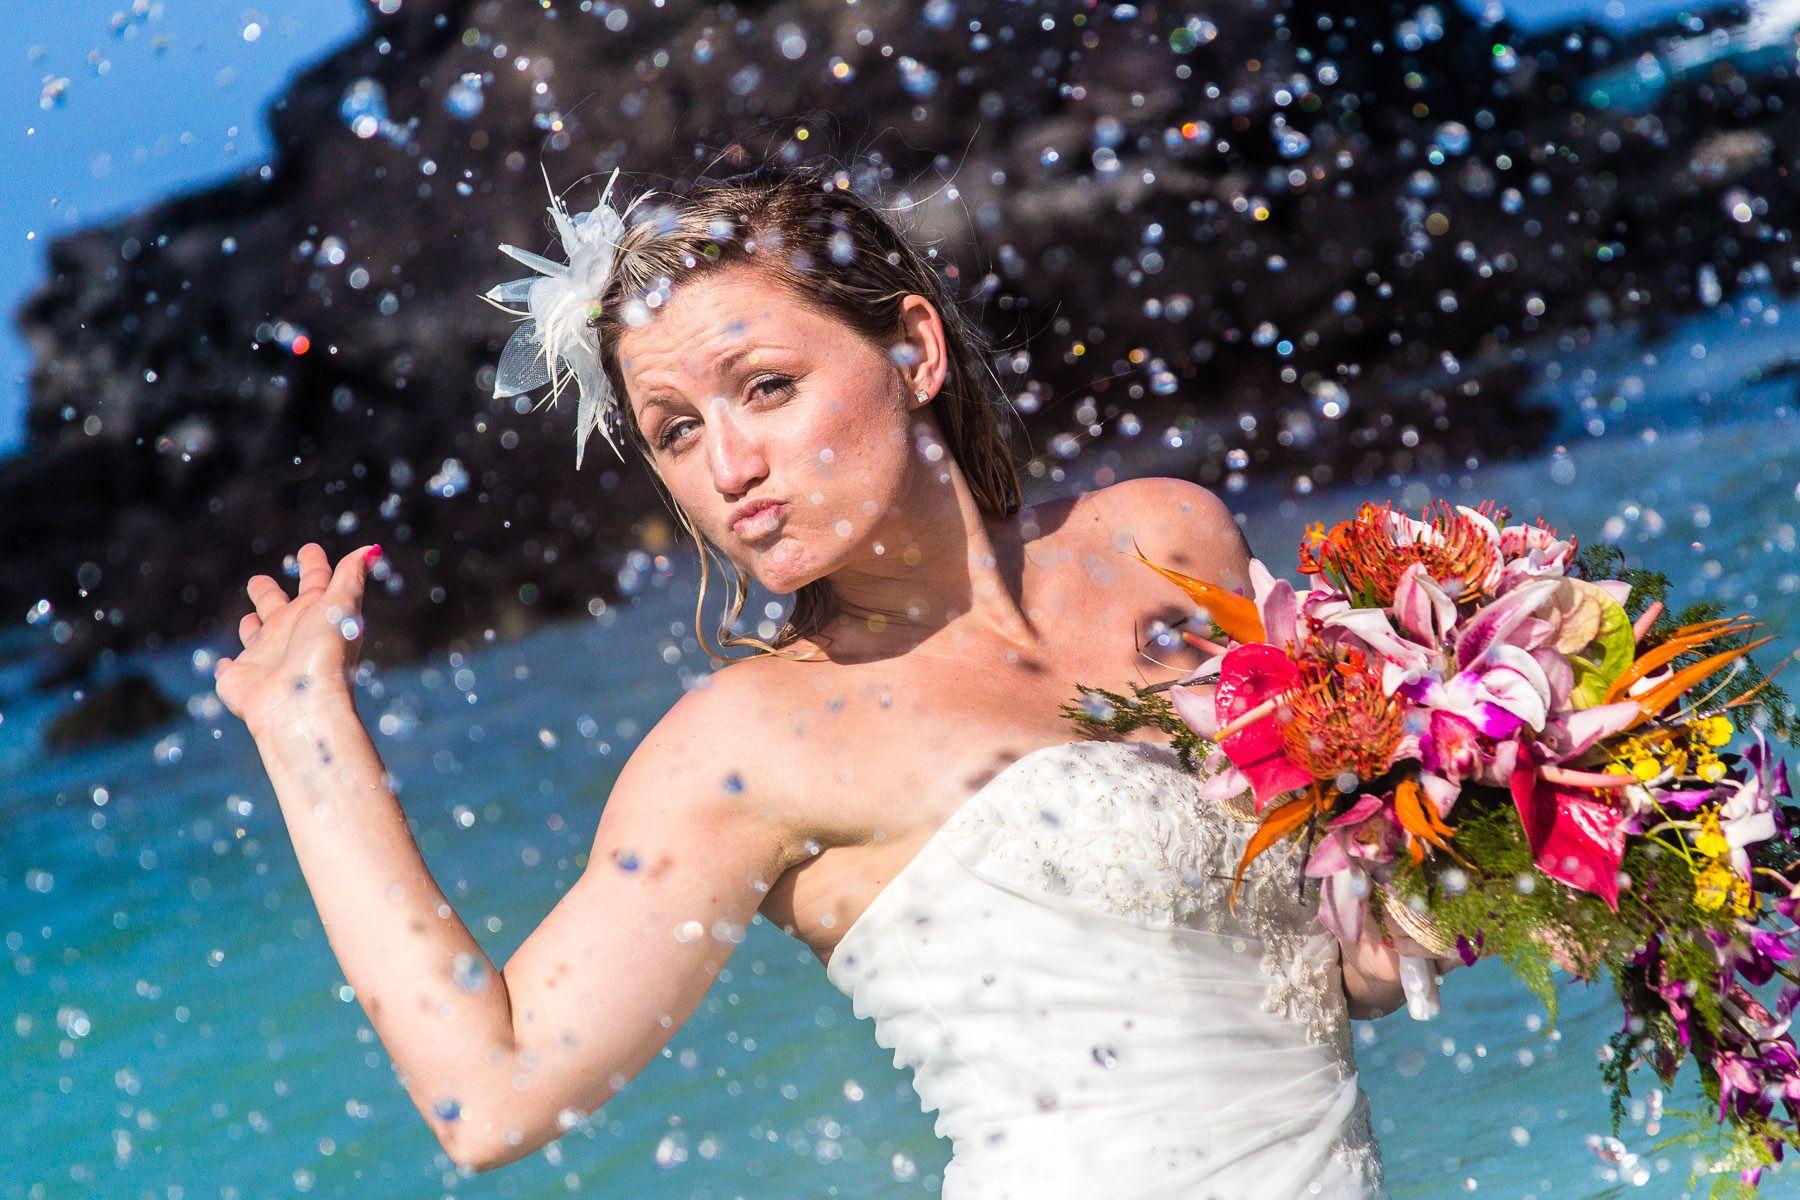 139_1kailua_kona__honolulu__hawaii__wedding__photographer_1473.jpg